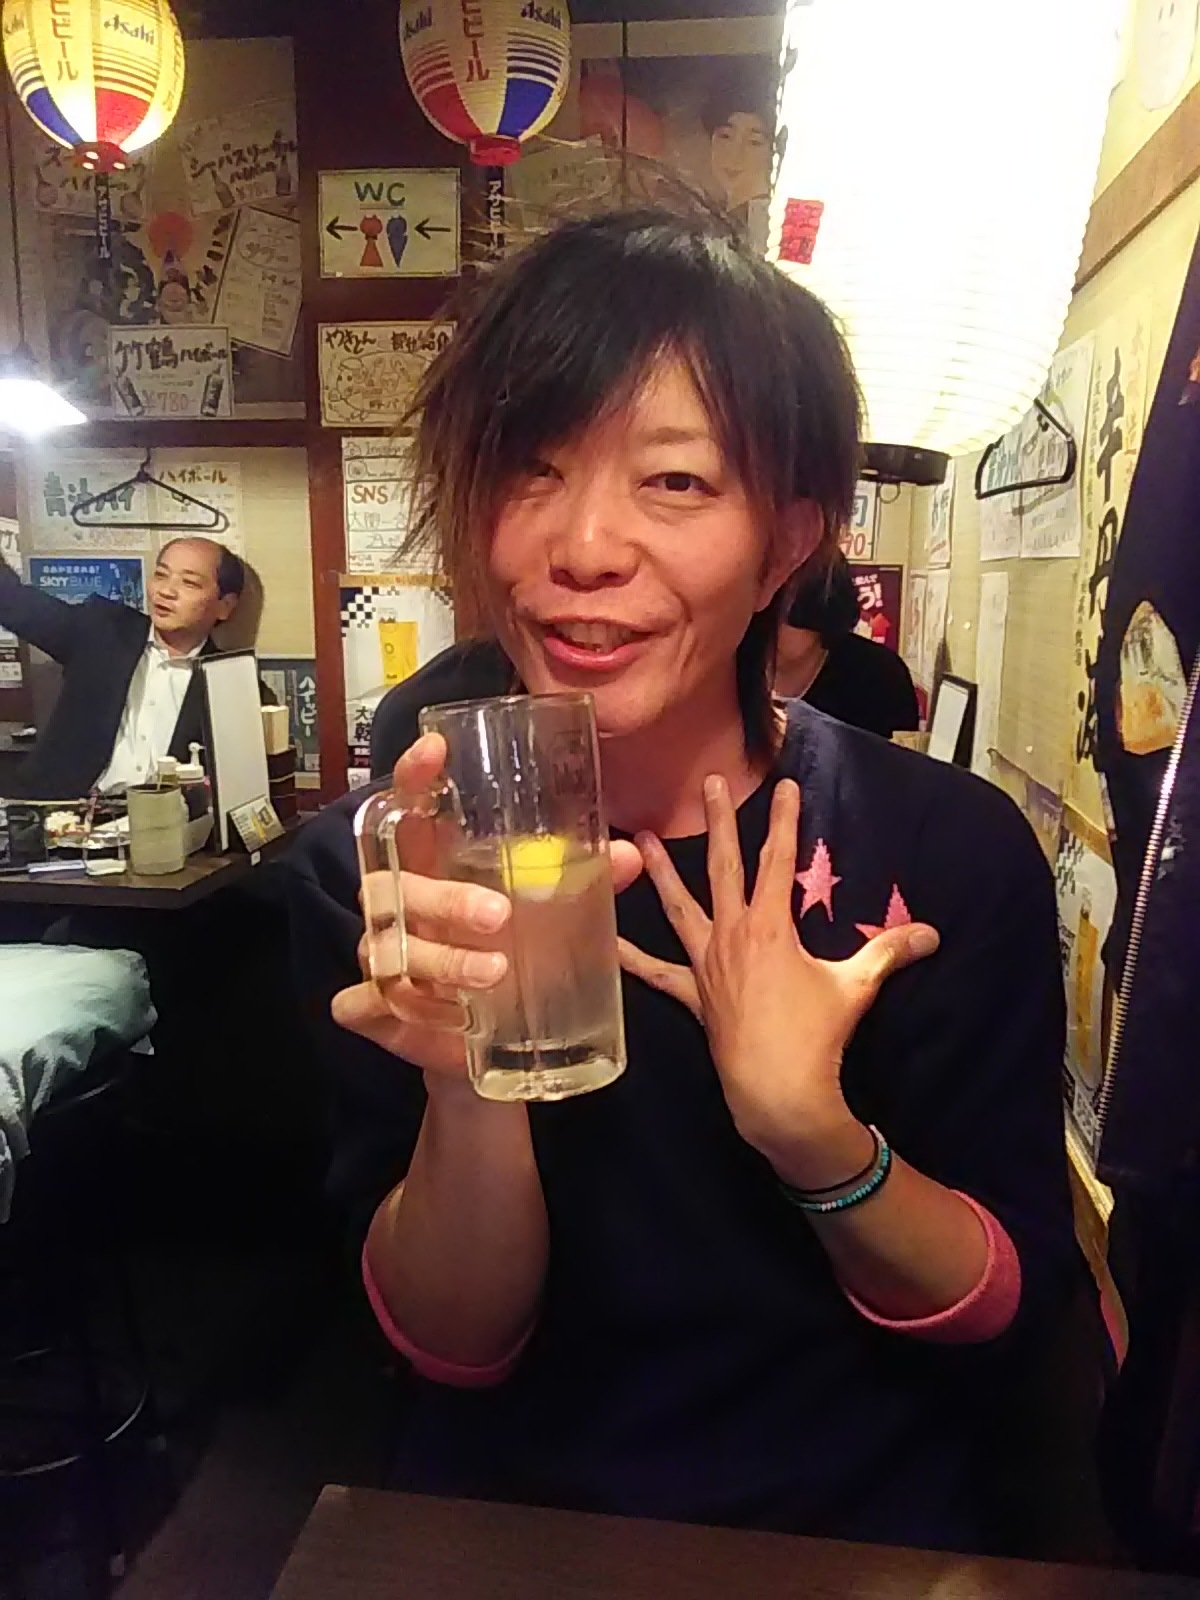 with、キショー!!_e0188079_21490368.jpg